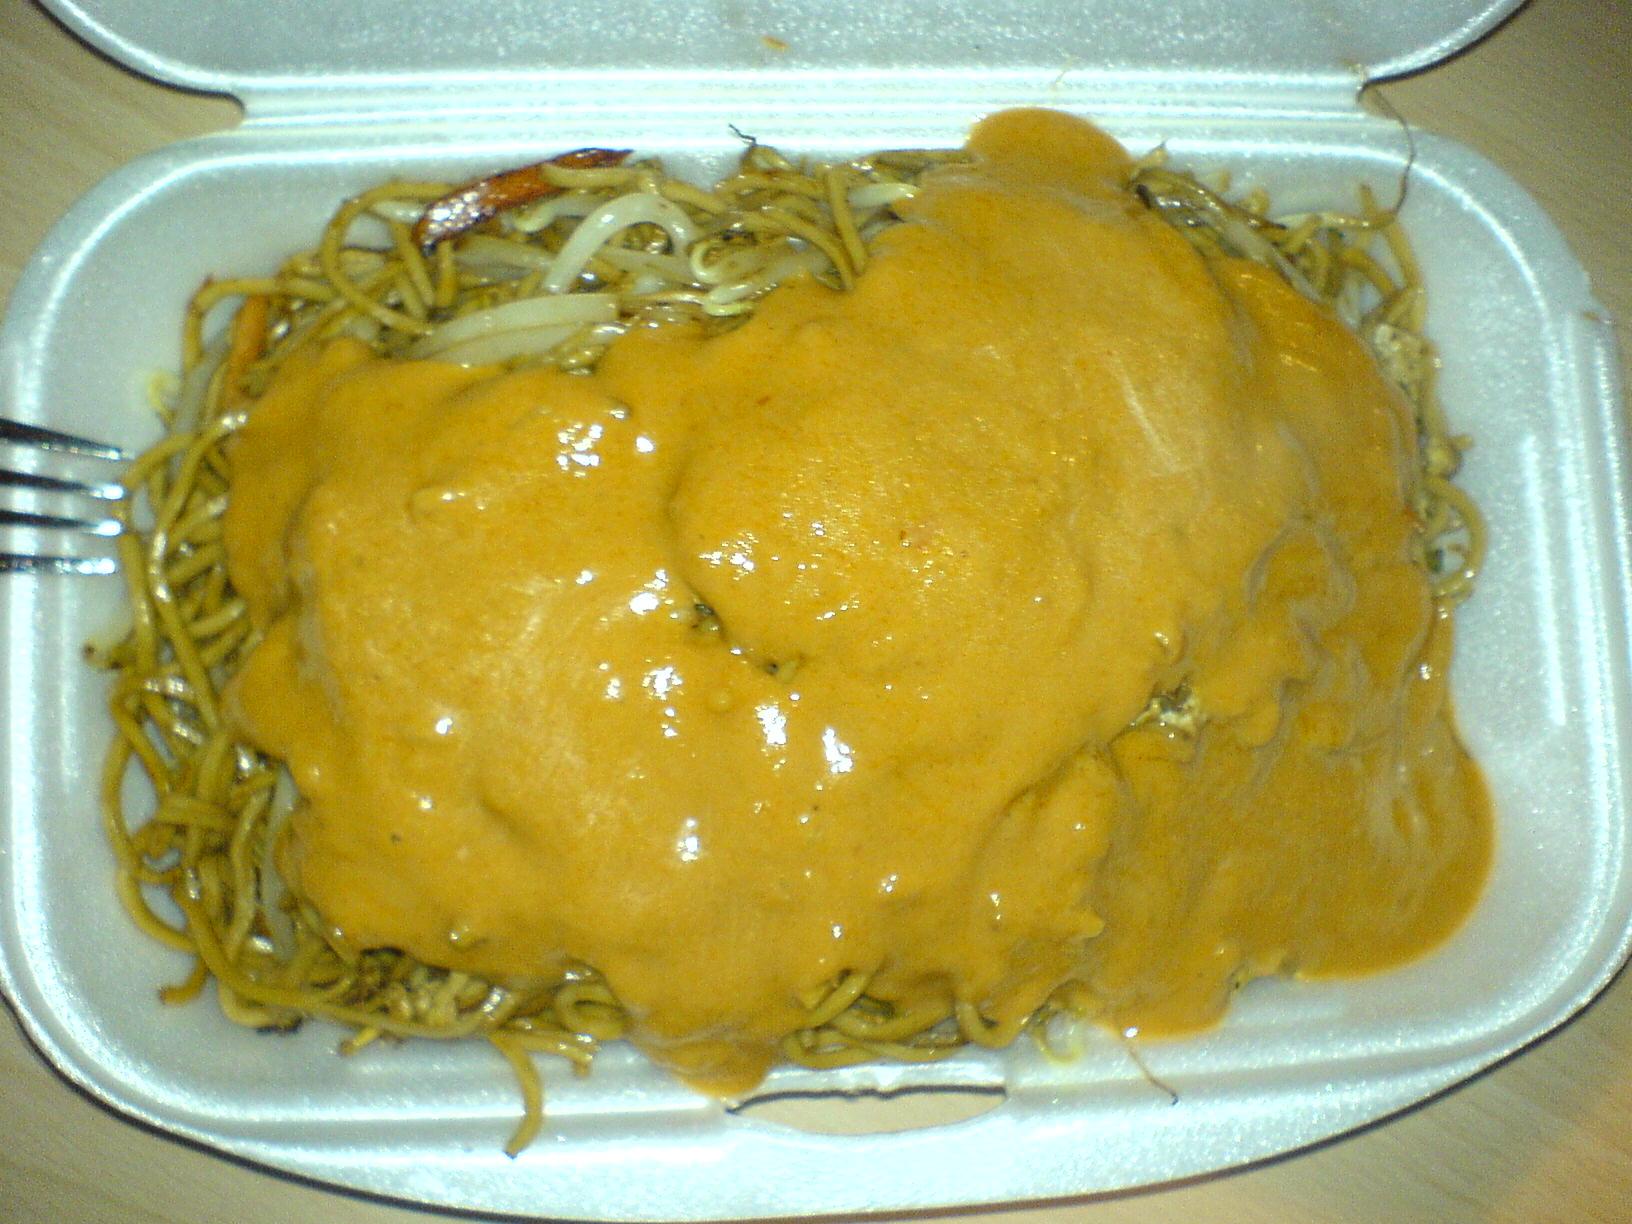 https://foodloader.net/Holz_2007-11-29_Asianudeln_in_Satesauce.jpg